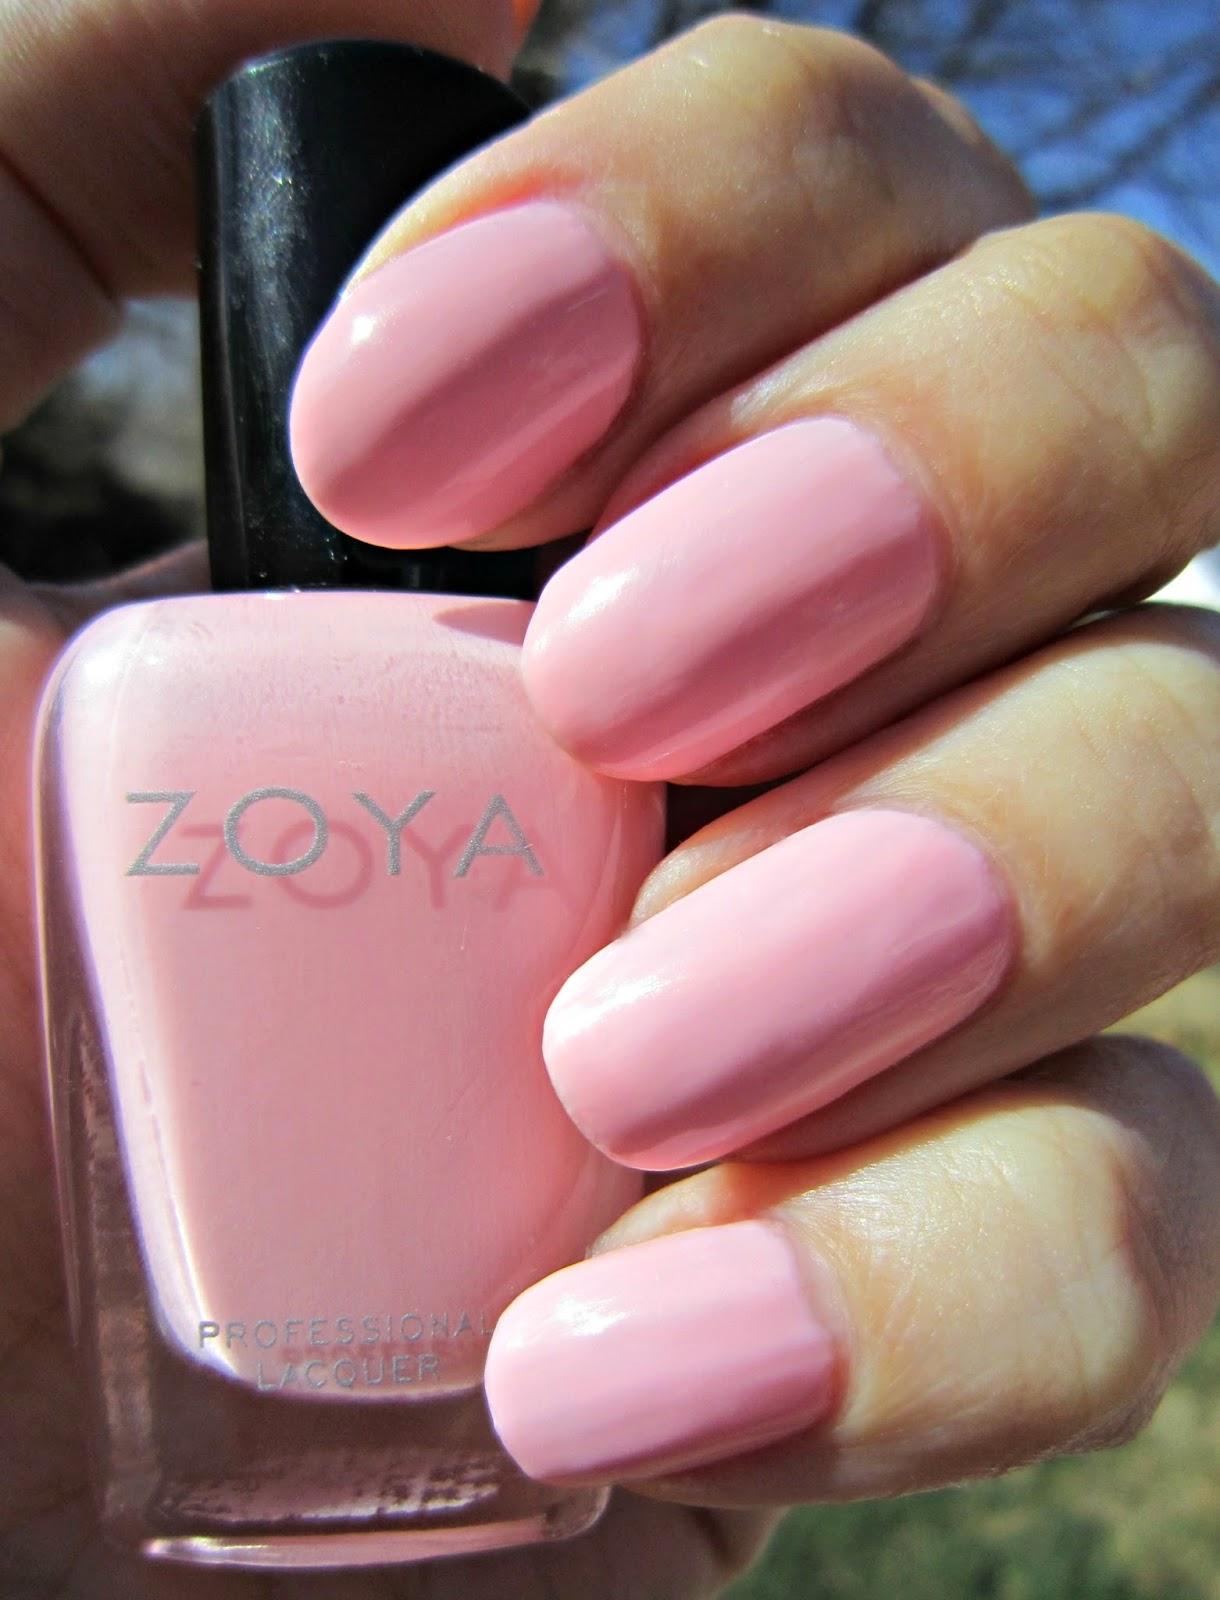 Zoya Dot is from their Awaken collection for Spring 2014  Zoya Dot